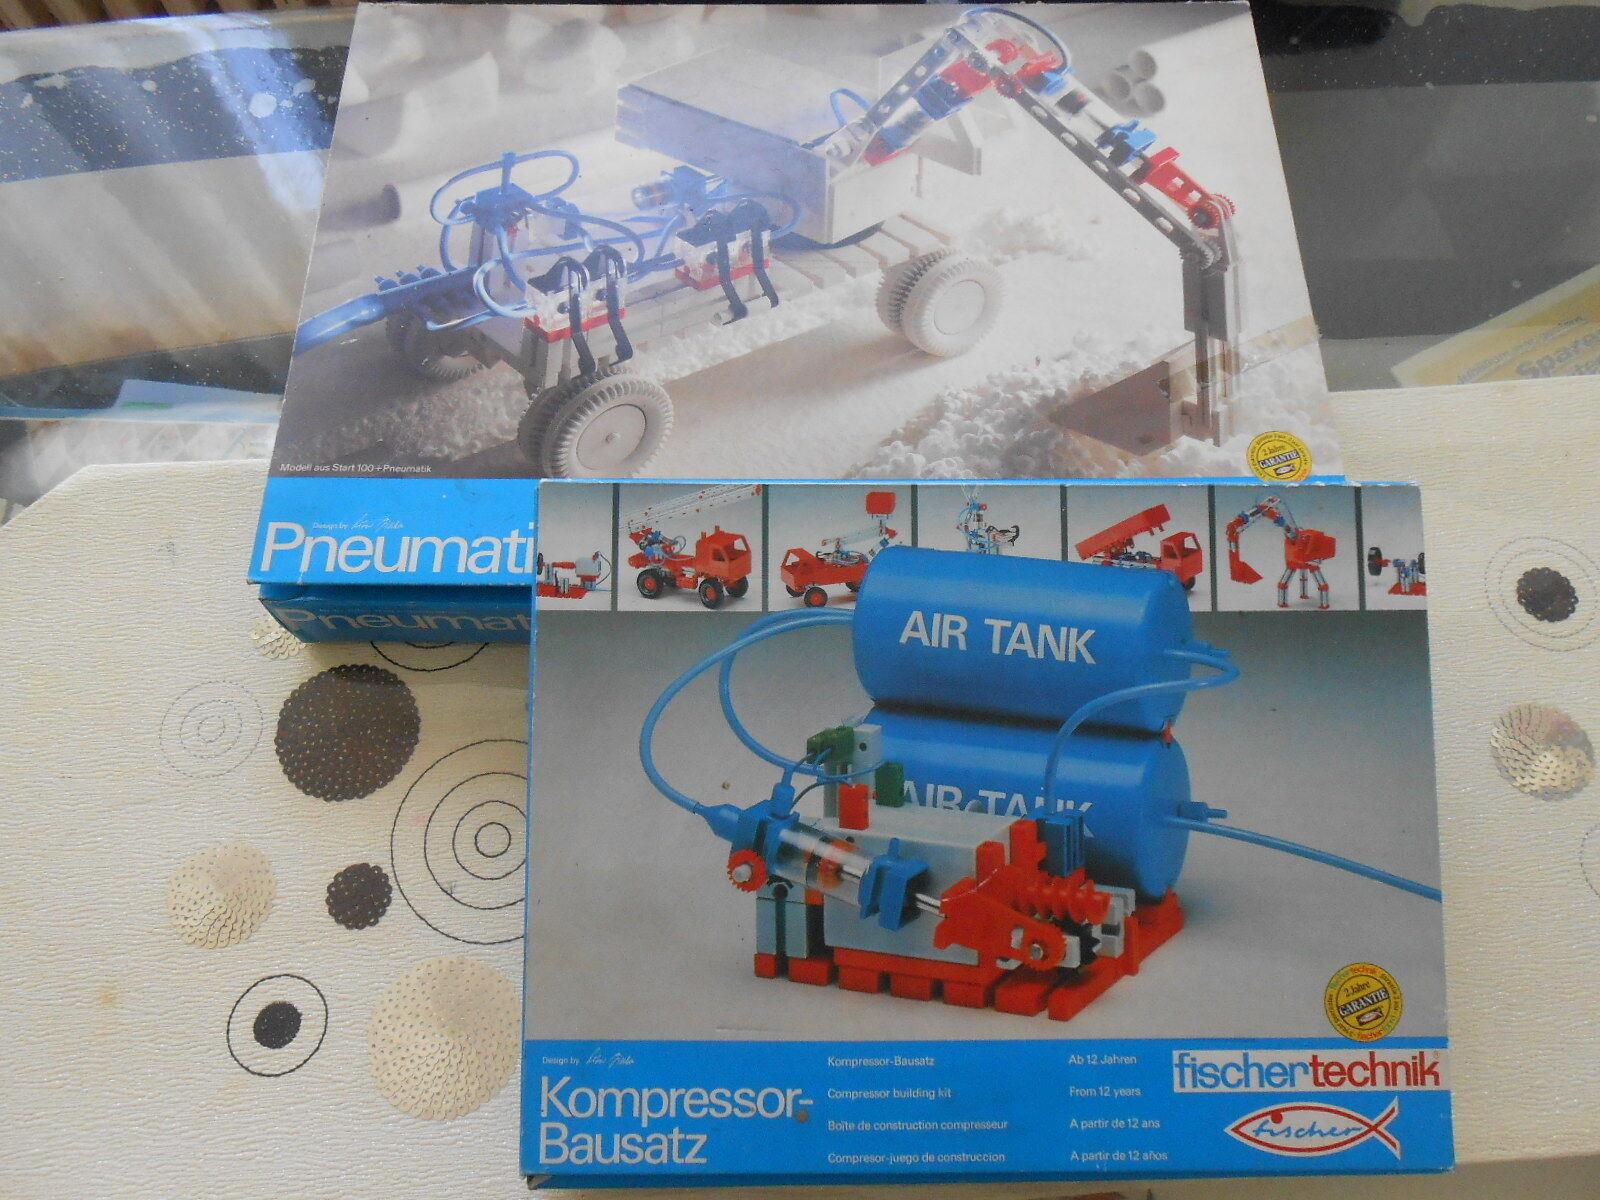 Fischertechnik Pneumatic with Compressor Kit both Original Boxed